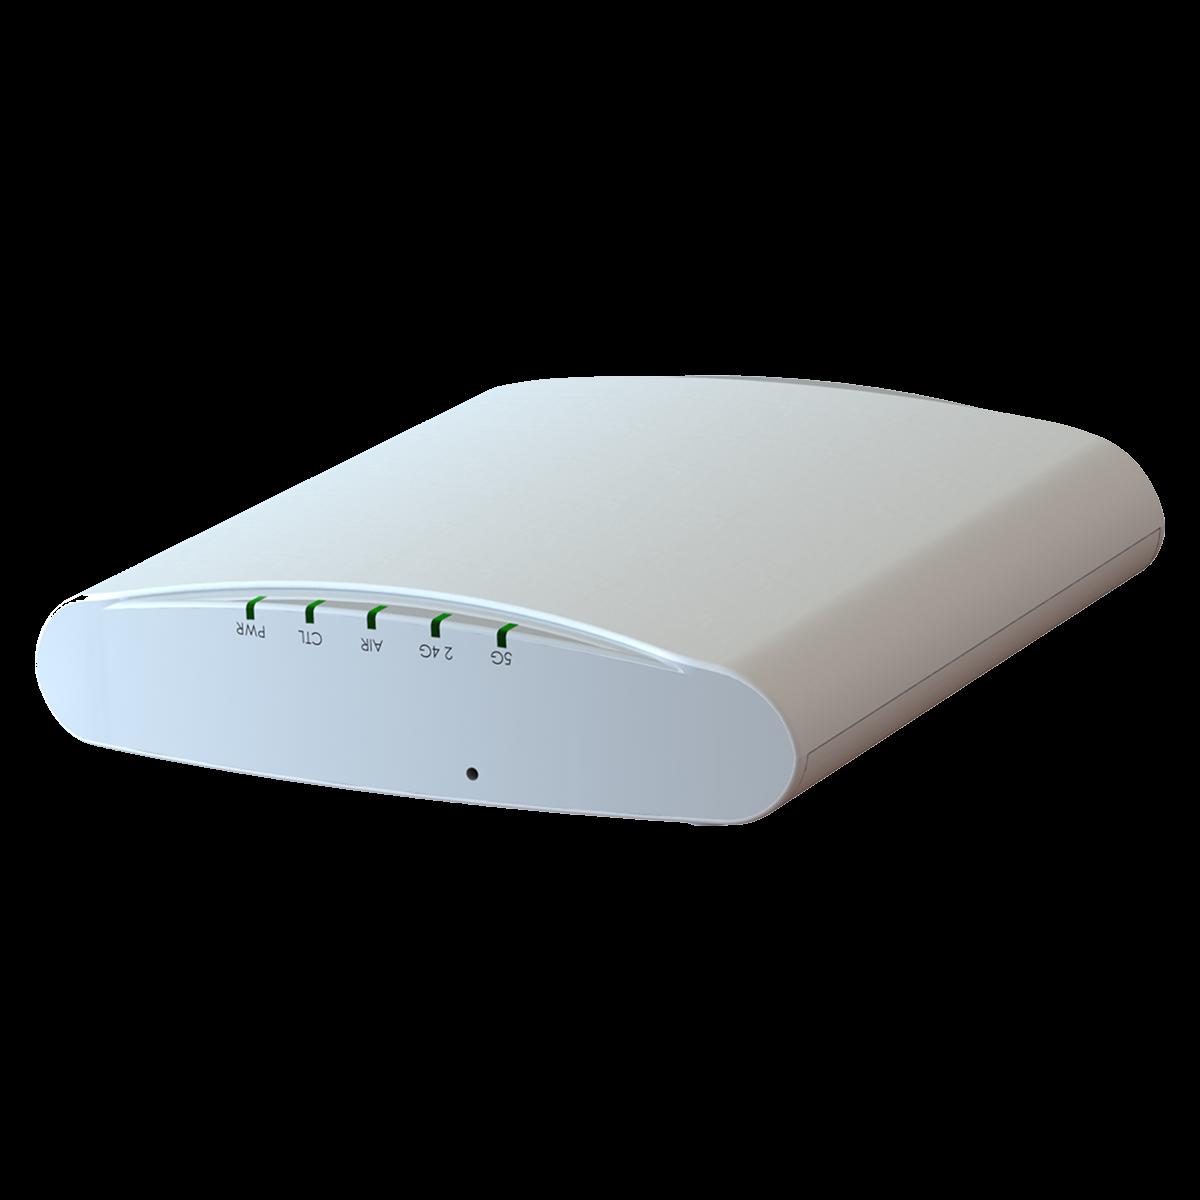 Ruckus ZoneFlex R310 Smart Wi-Fi Access Points with Adaptive Antenna Technology